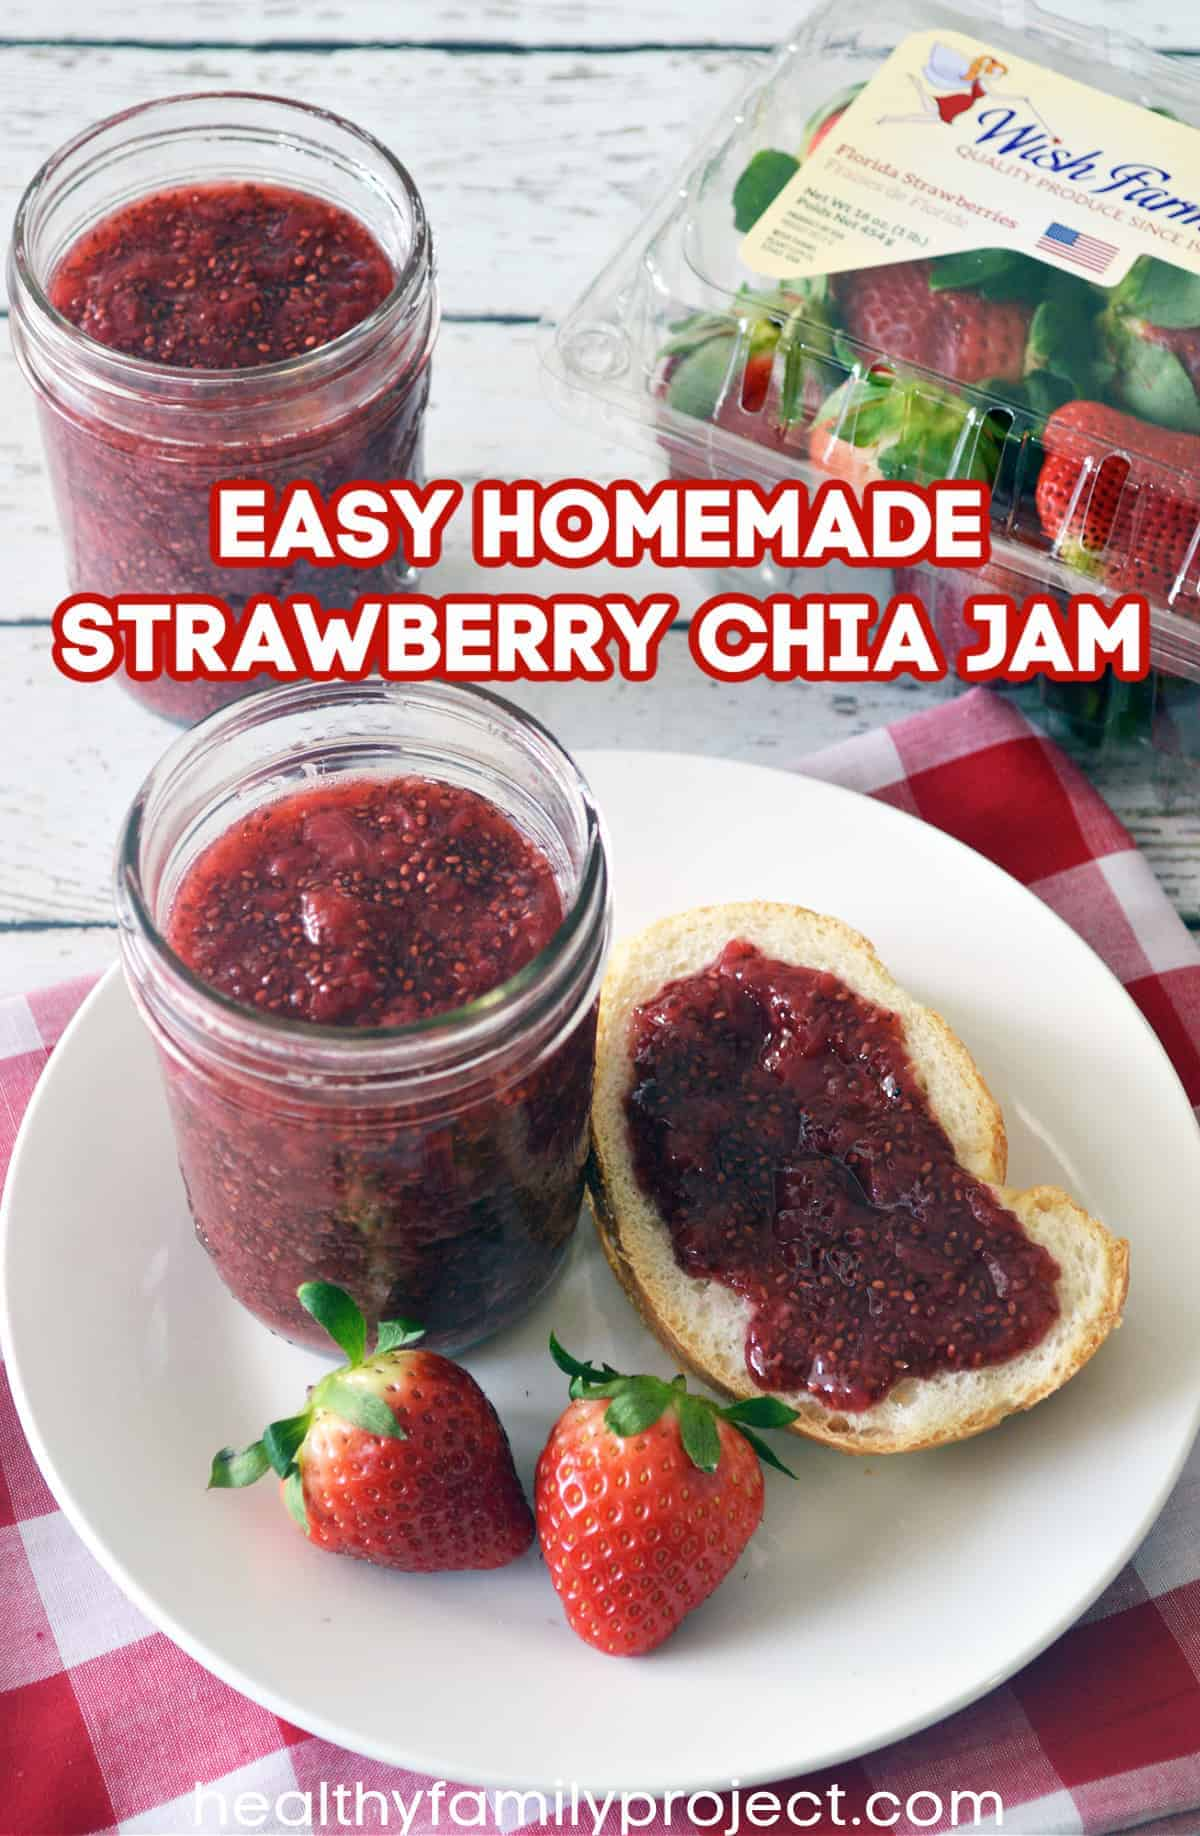 Homemade Strawberry Chia Jam